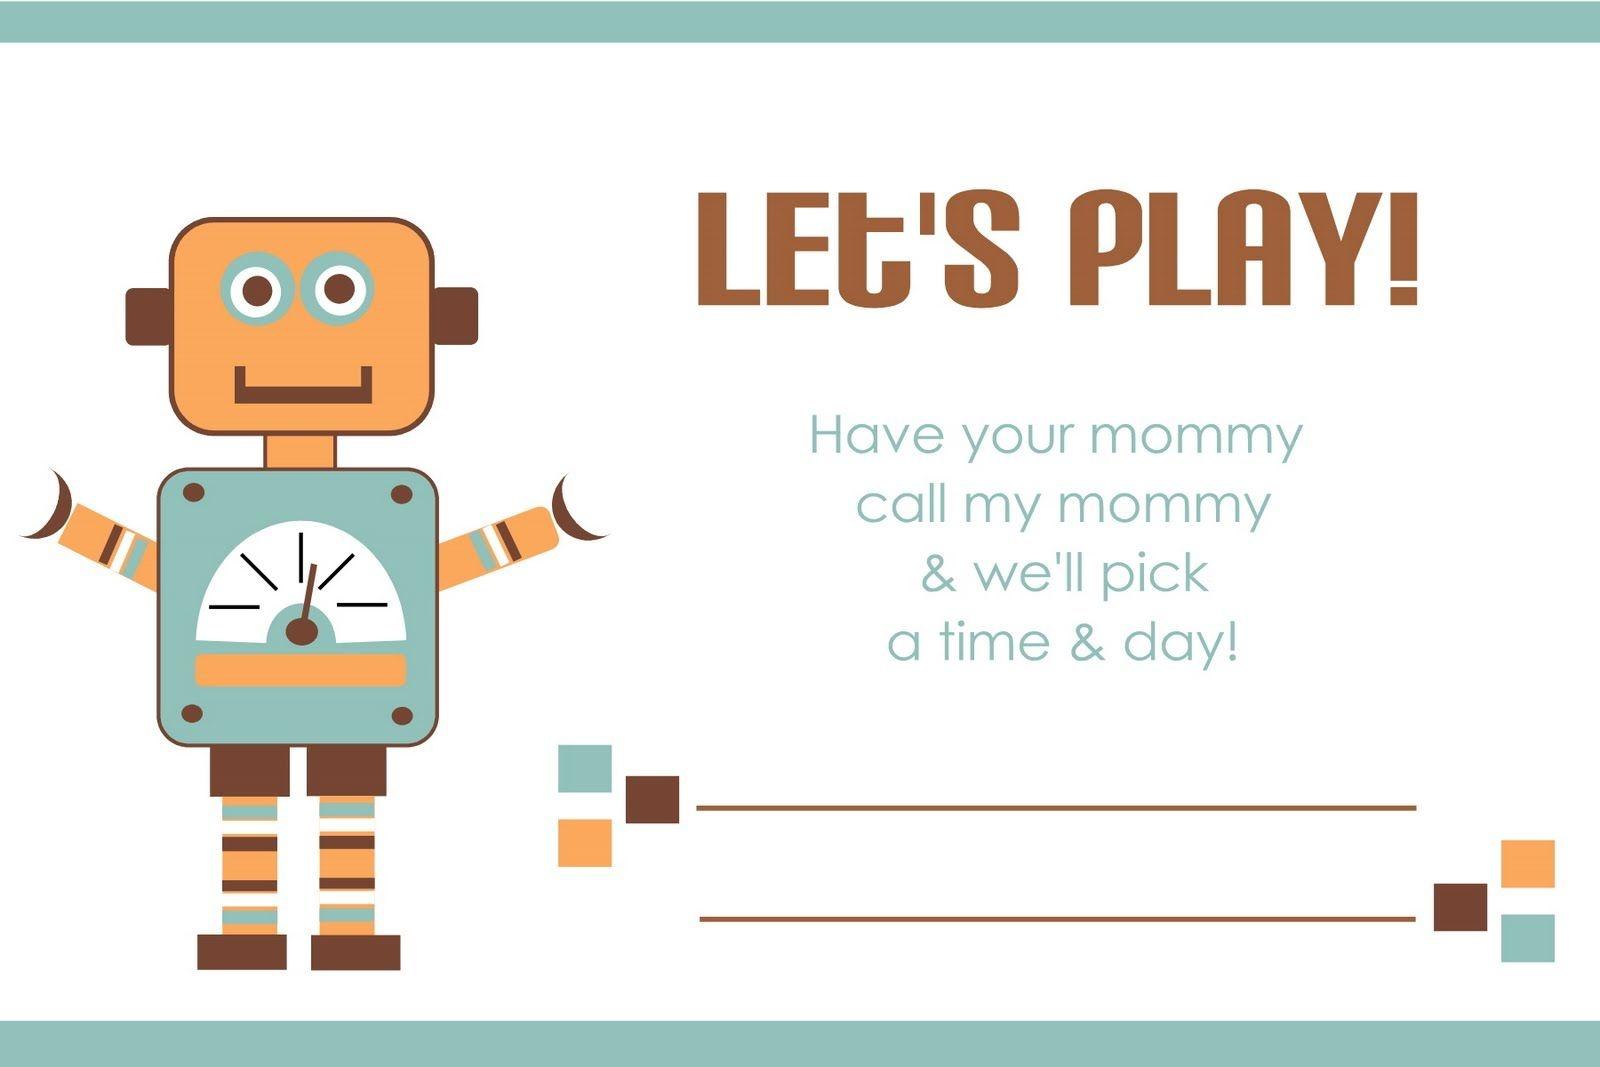 Printable Play Date Card | Printables | Kids Cards, Fun Projects For - Free Printable Play Date Cards